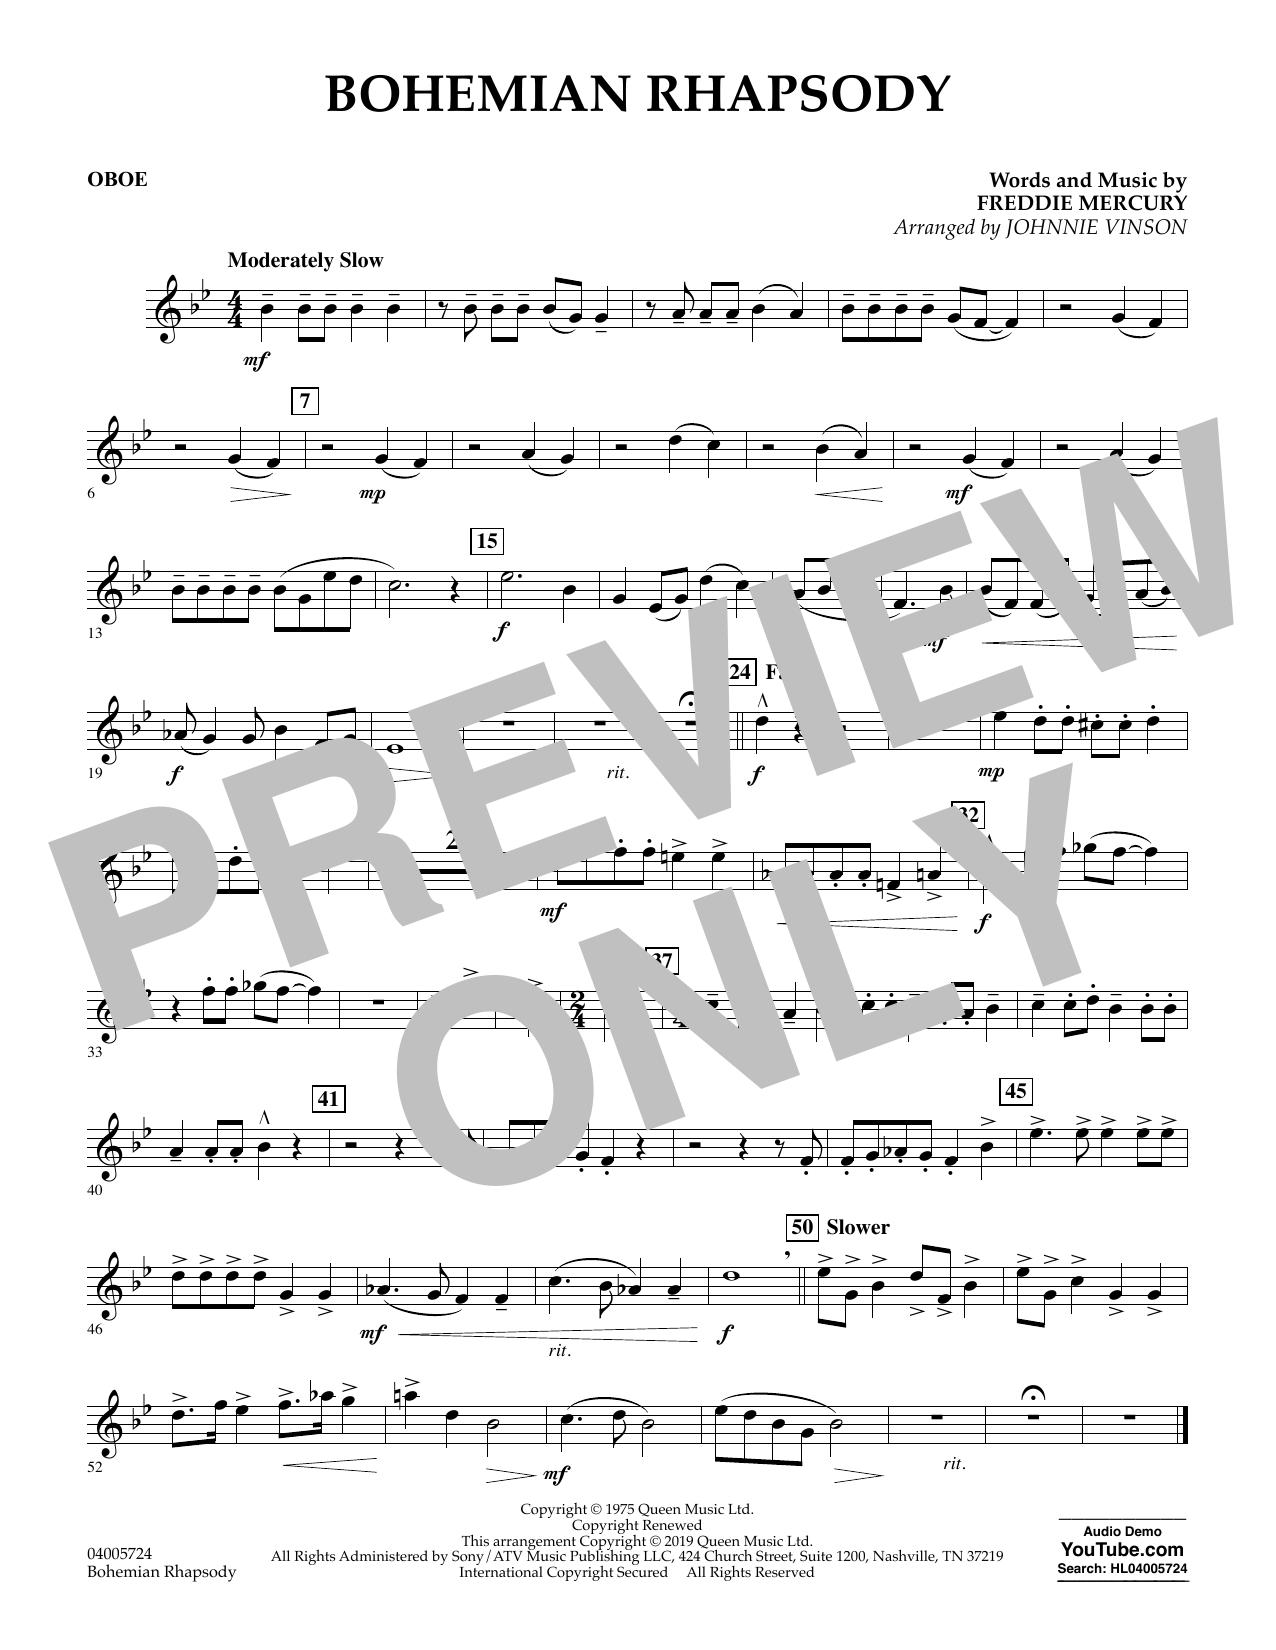 Bohemian Rhapsody (arr. Johnnie Vinson) - Oboe (Concert Band)